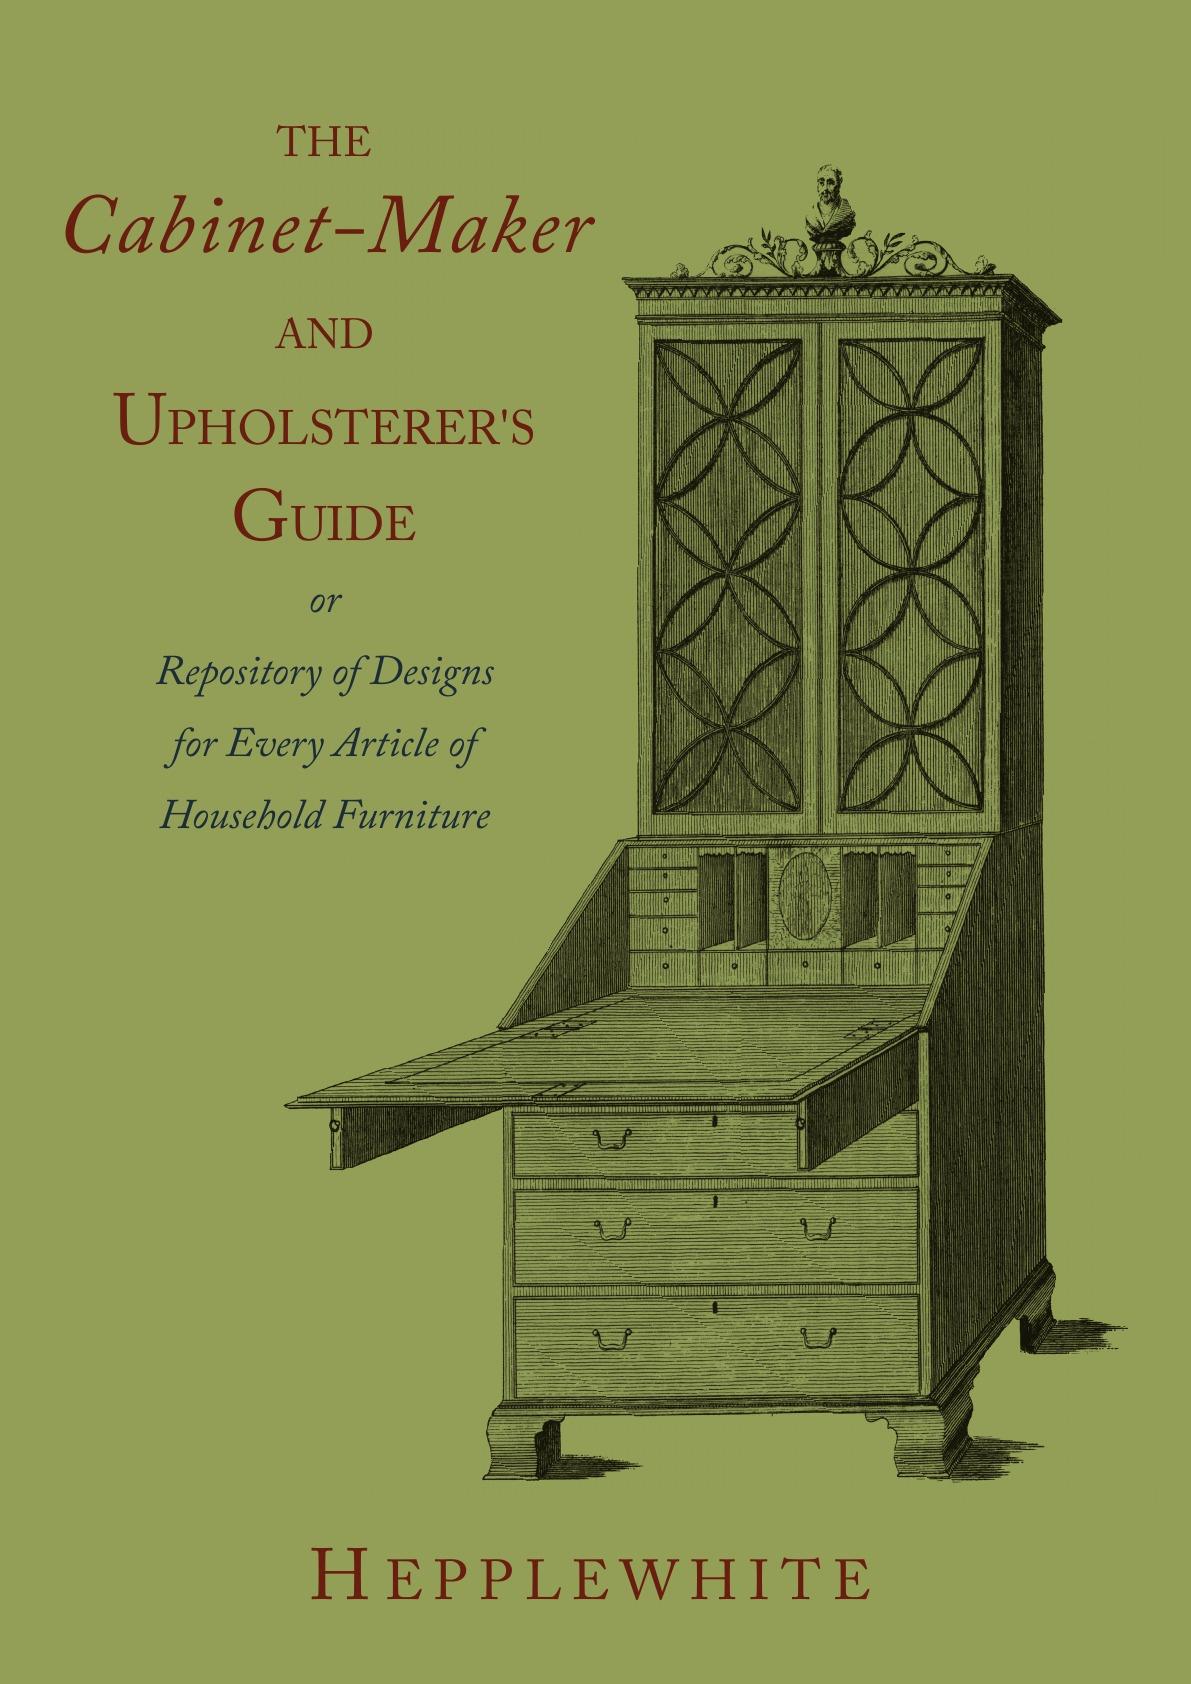 купить George Hepplewhite The Cabinet-Maker and Upholsterer's Guide по цене 1490 рублей